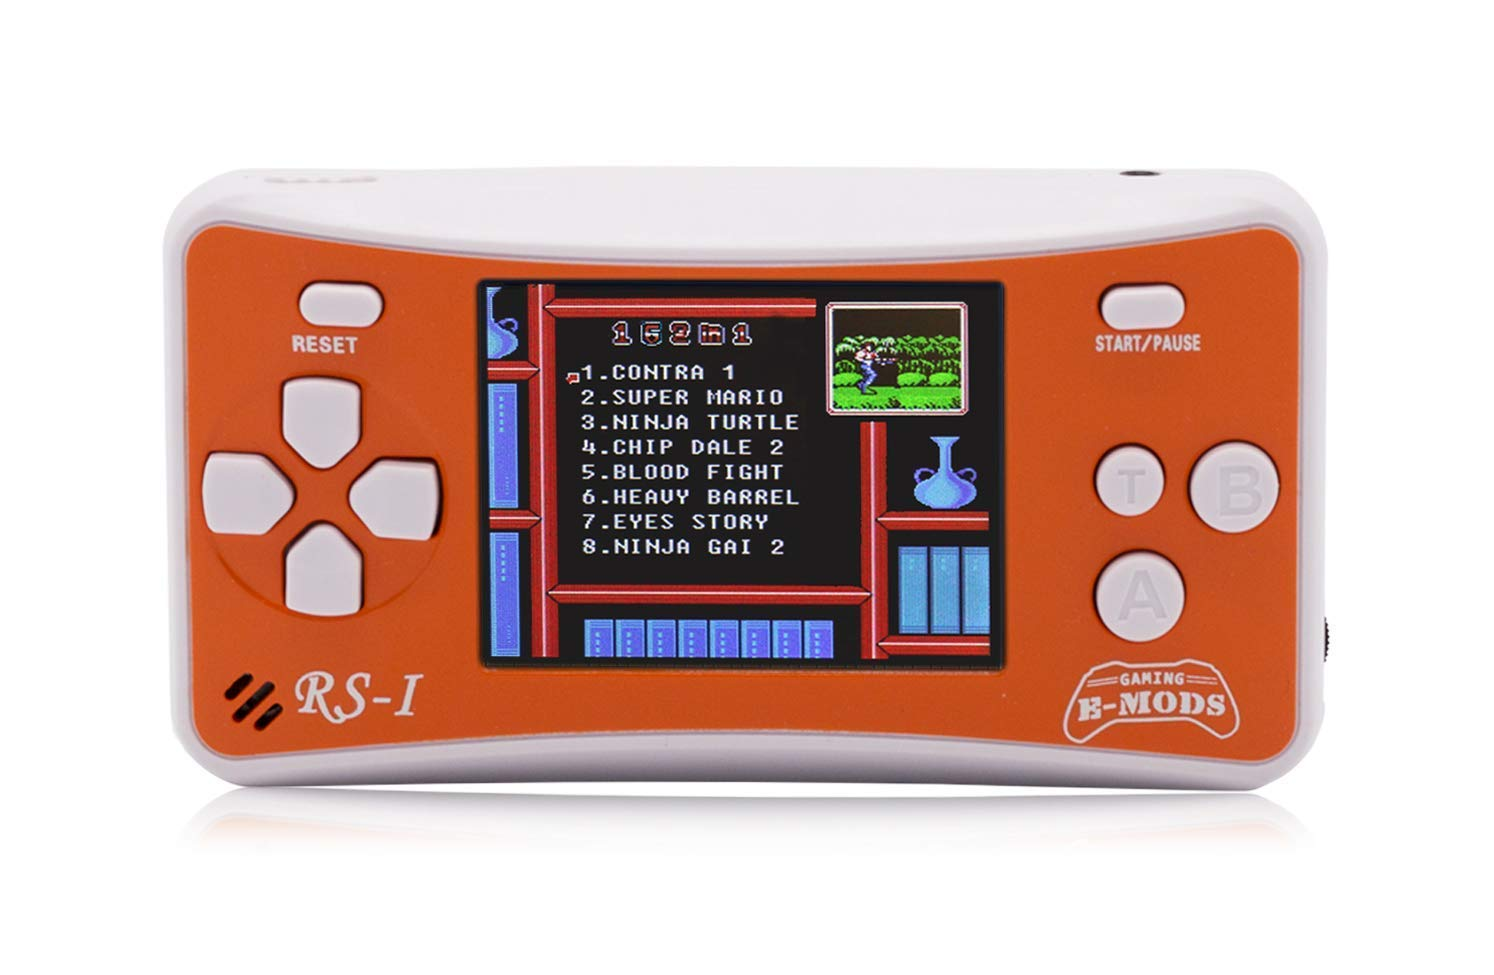 E-MODS GAMING 8-Bit Retro 2.5'' LCD 162x Video Games Portable Handheld Console (Orange)